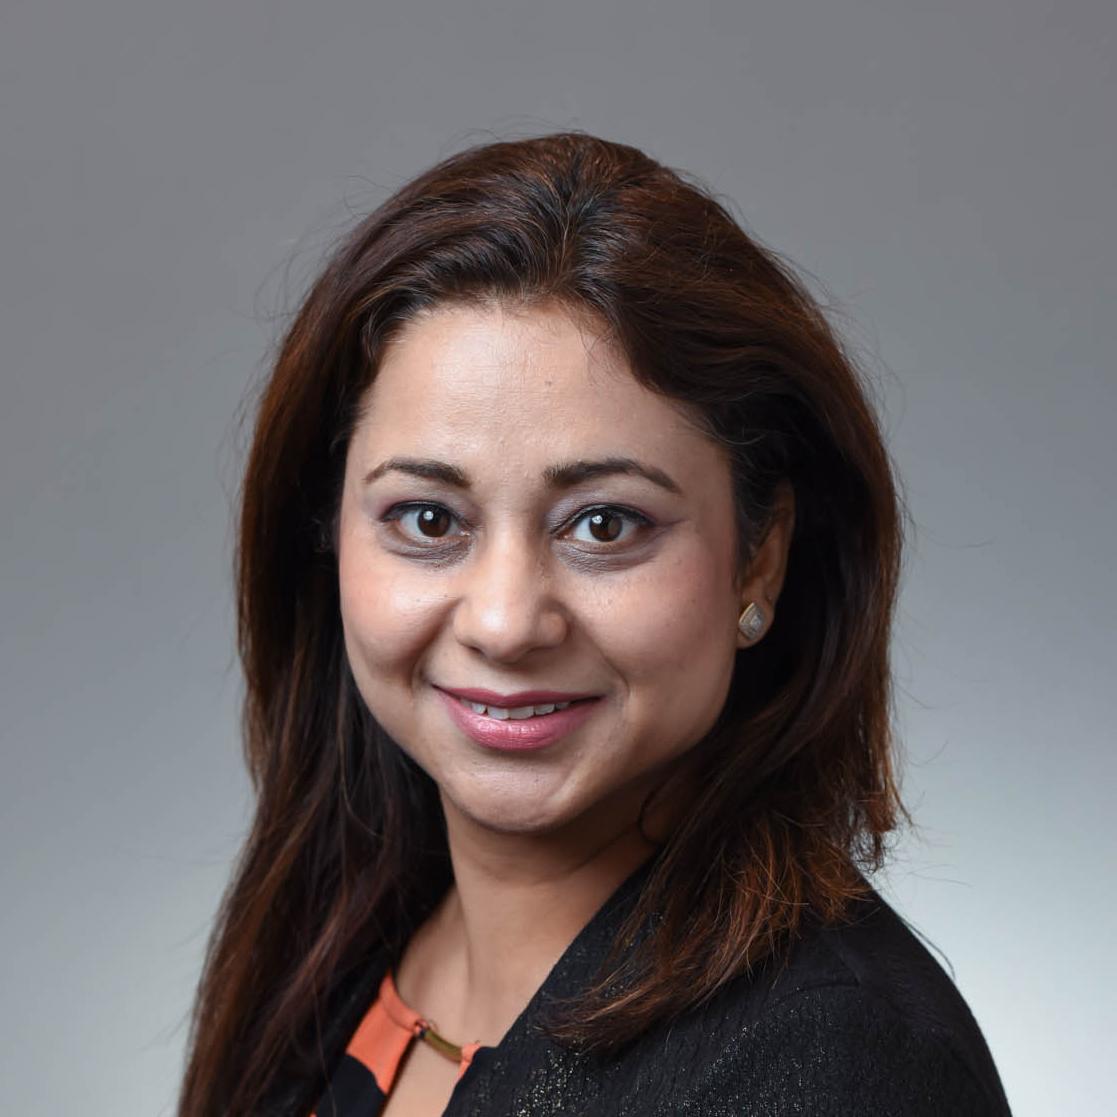 Dr. Aarti Puri